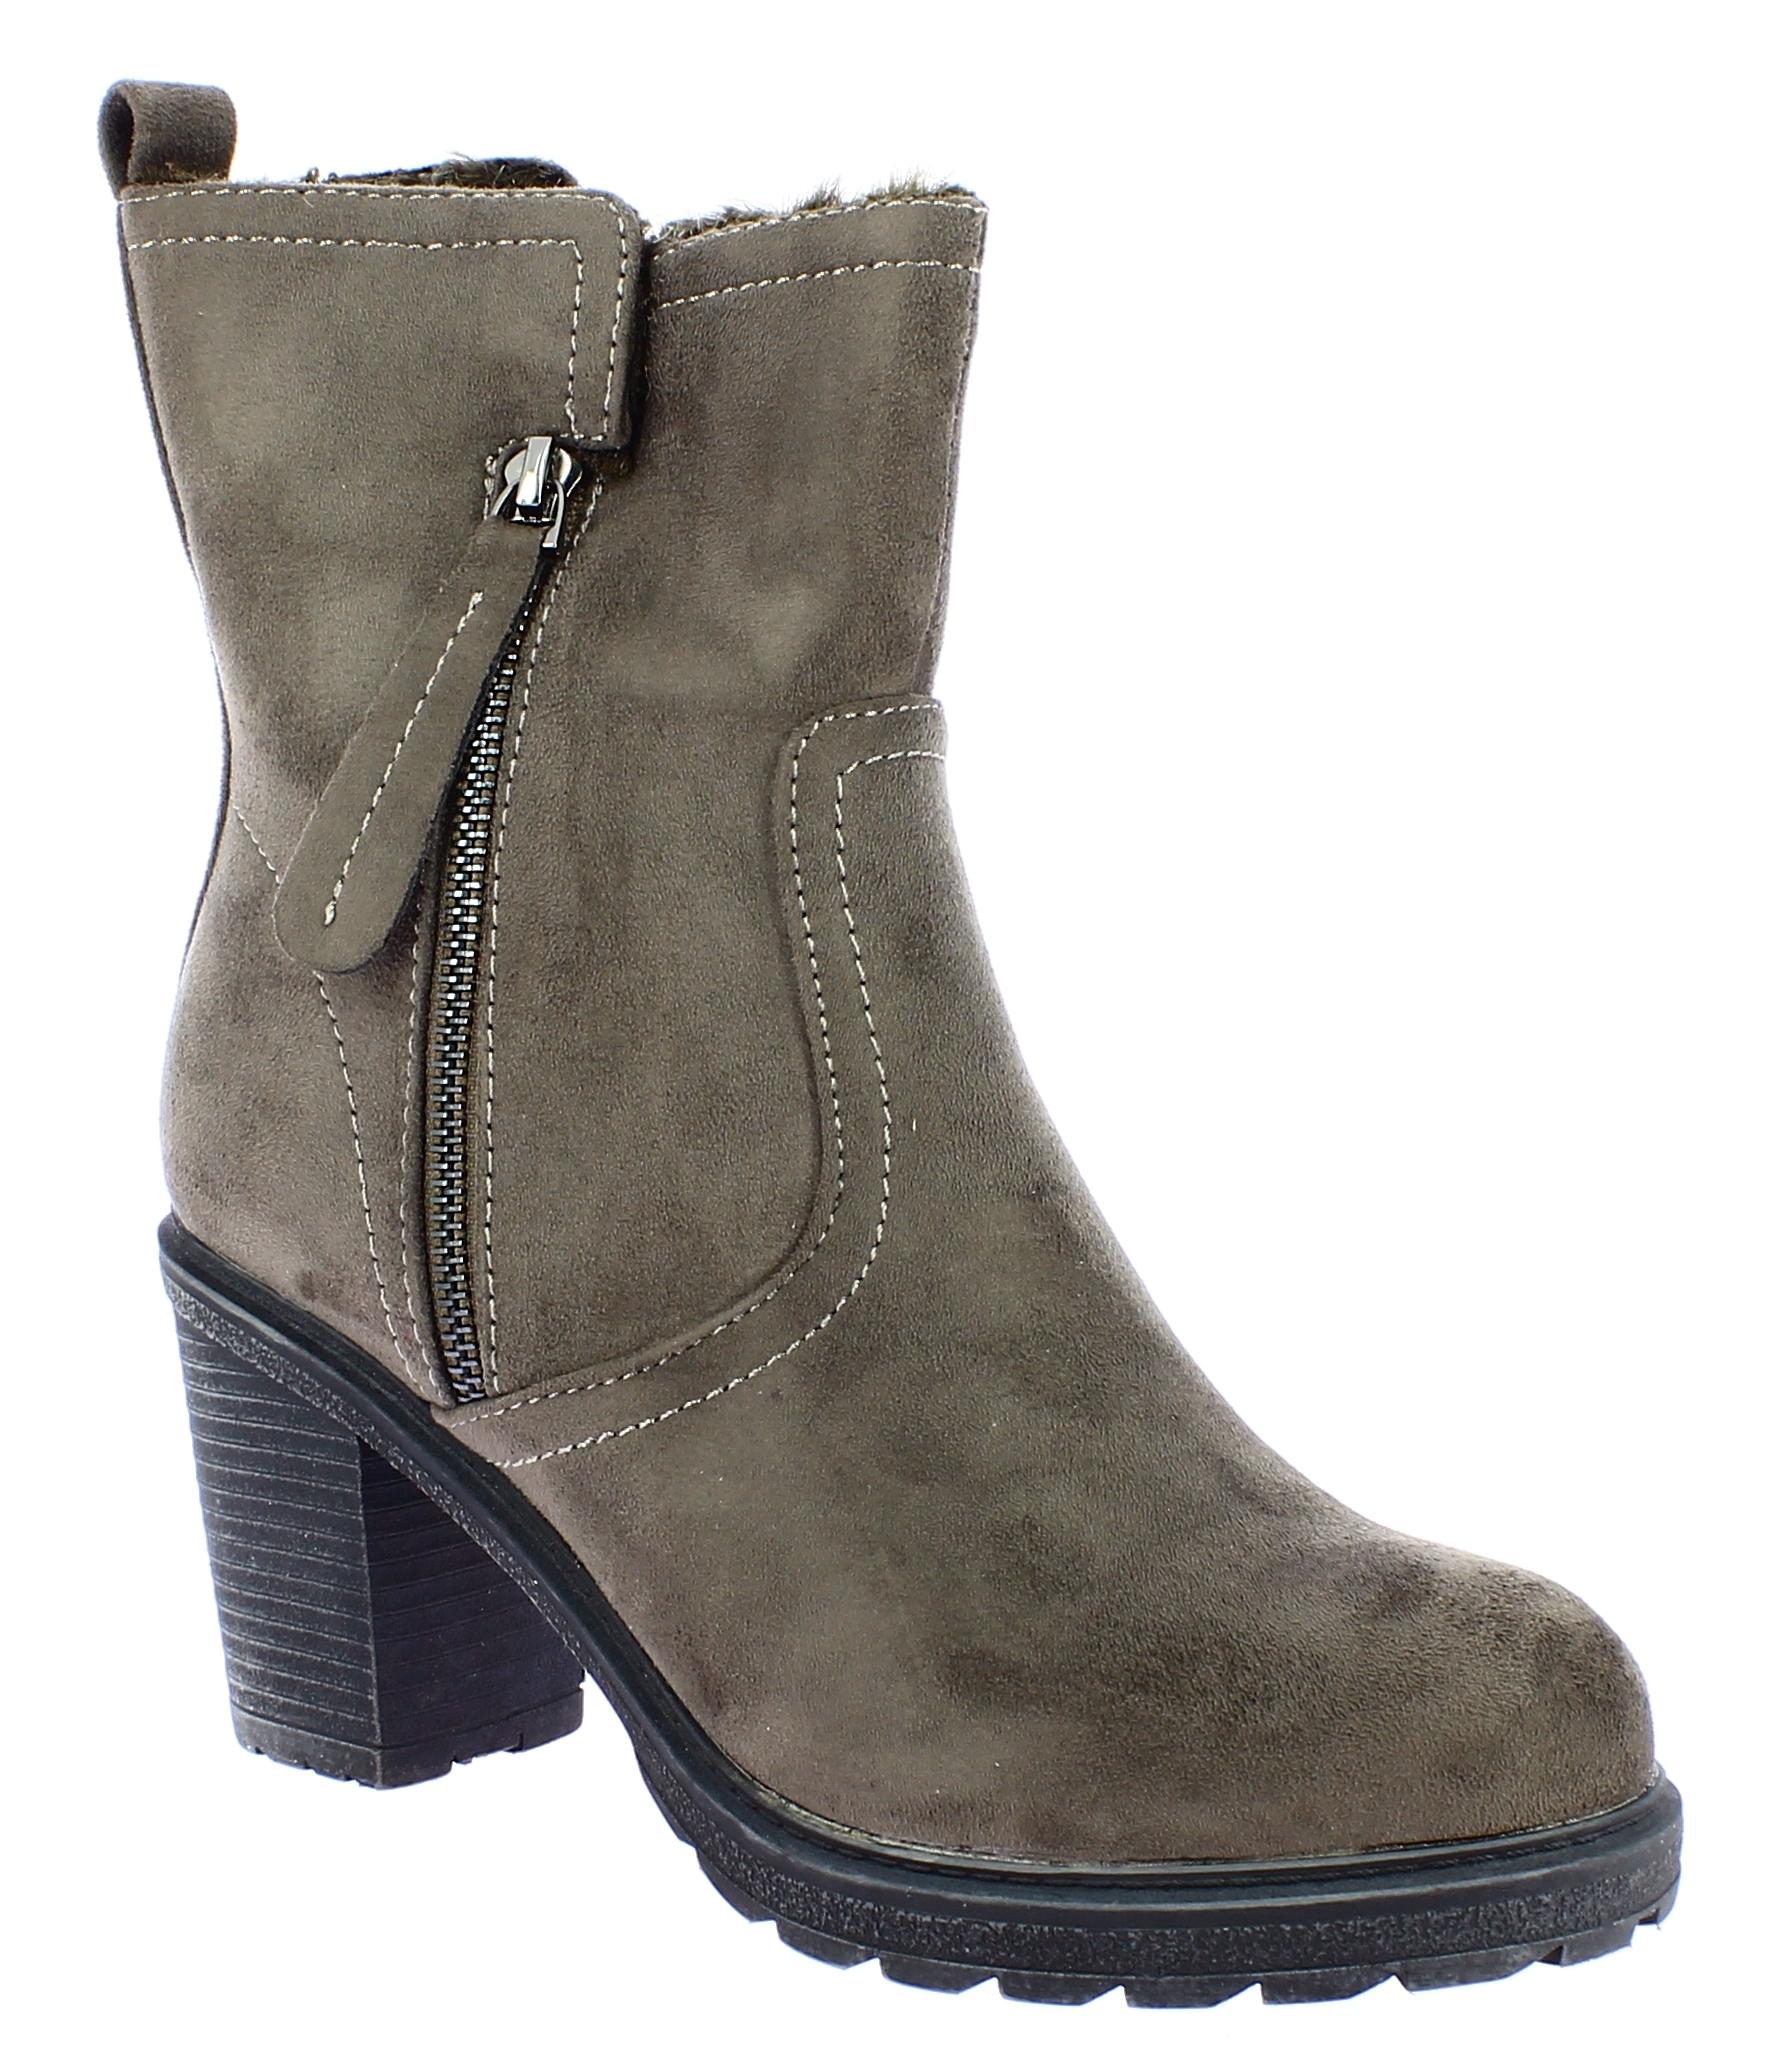 SCANDI Γυναικείο Μποτάκι 56-0391-C1 Ταούπε - SCANDI - 56-0391-C1 TAUPE-SCANDI-gr παπούτσια  new in